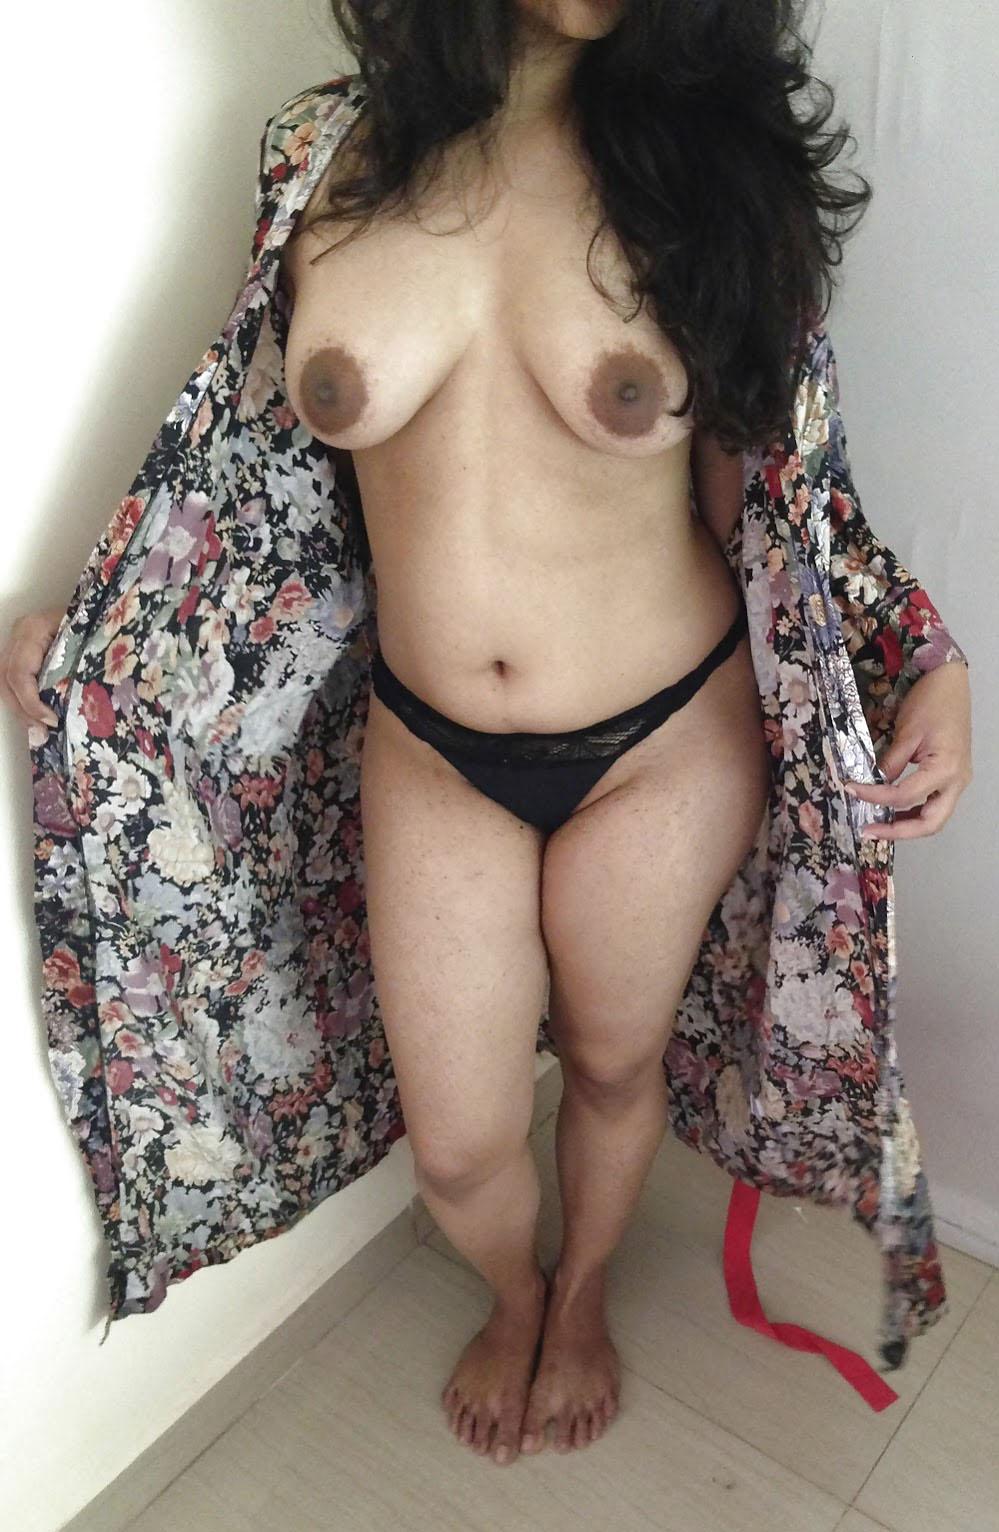 Boobs and hidden sex